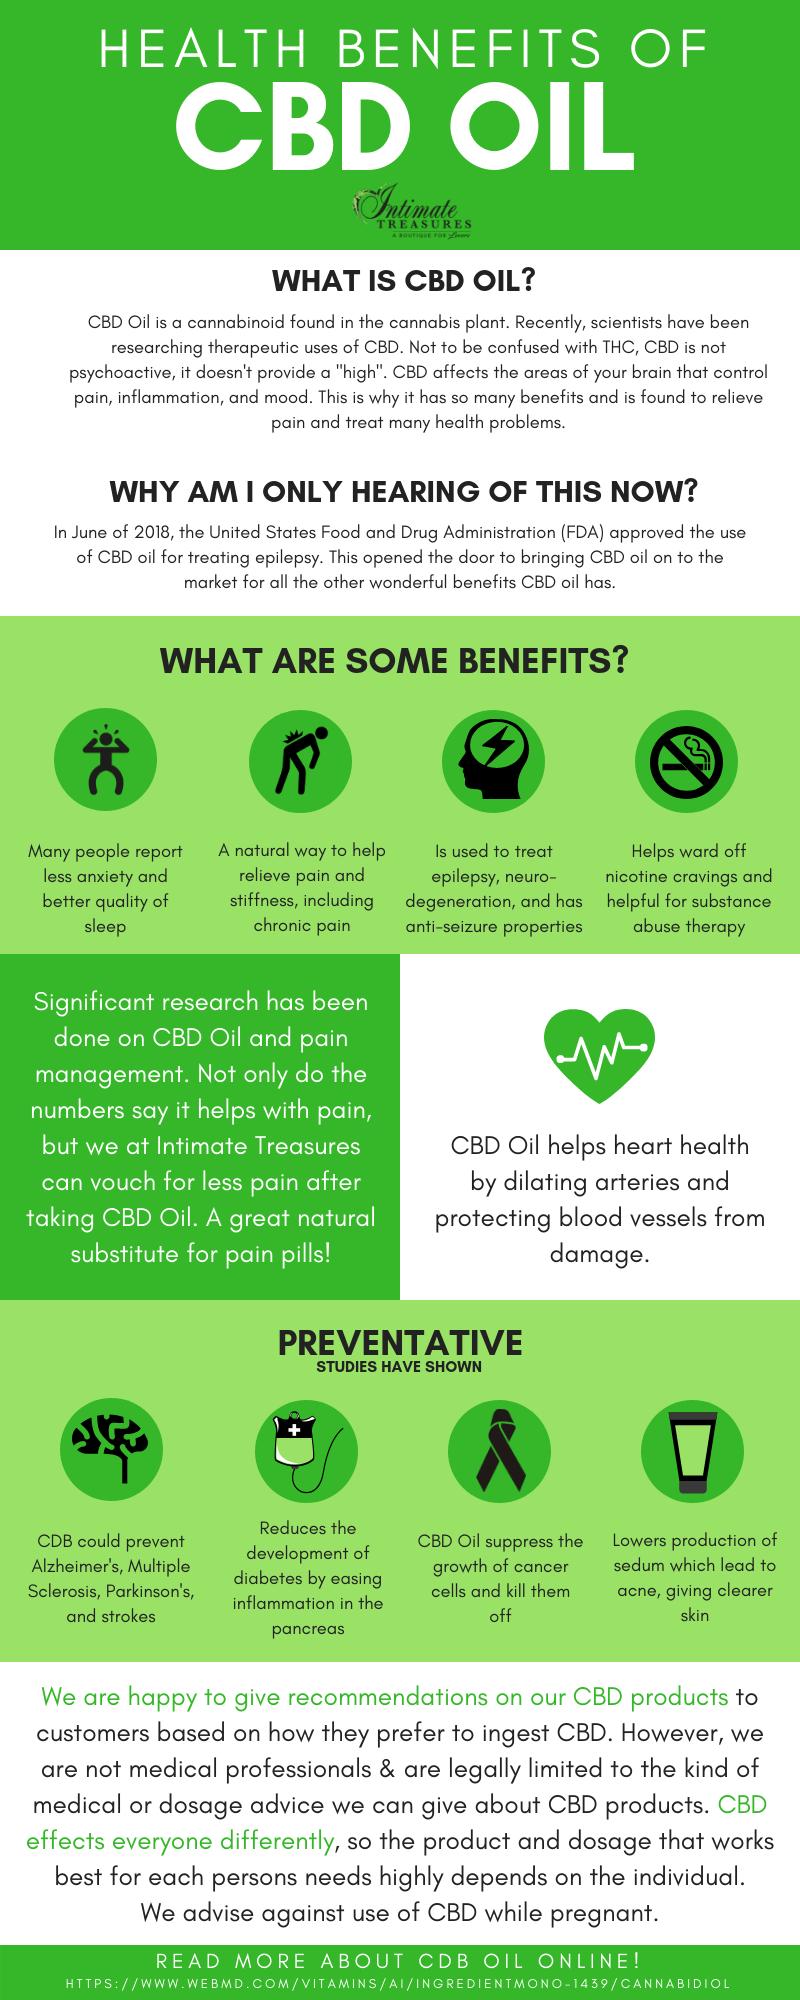 health benefits of cbd oil infographic